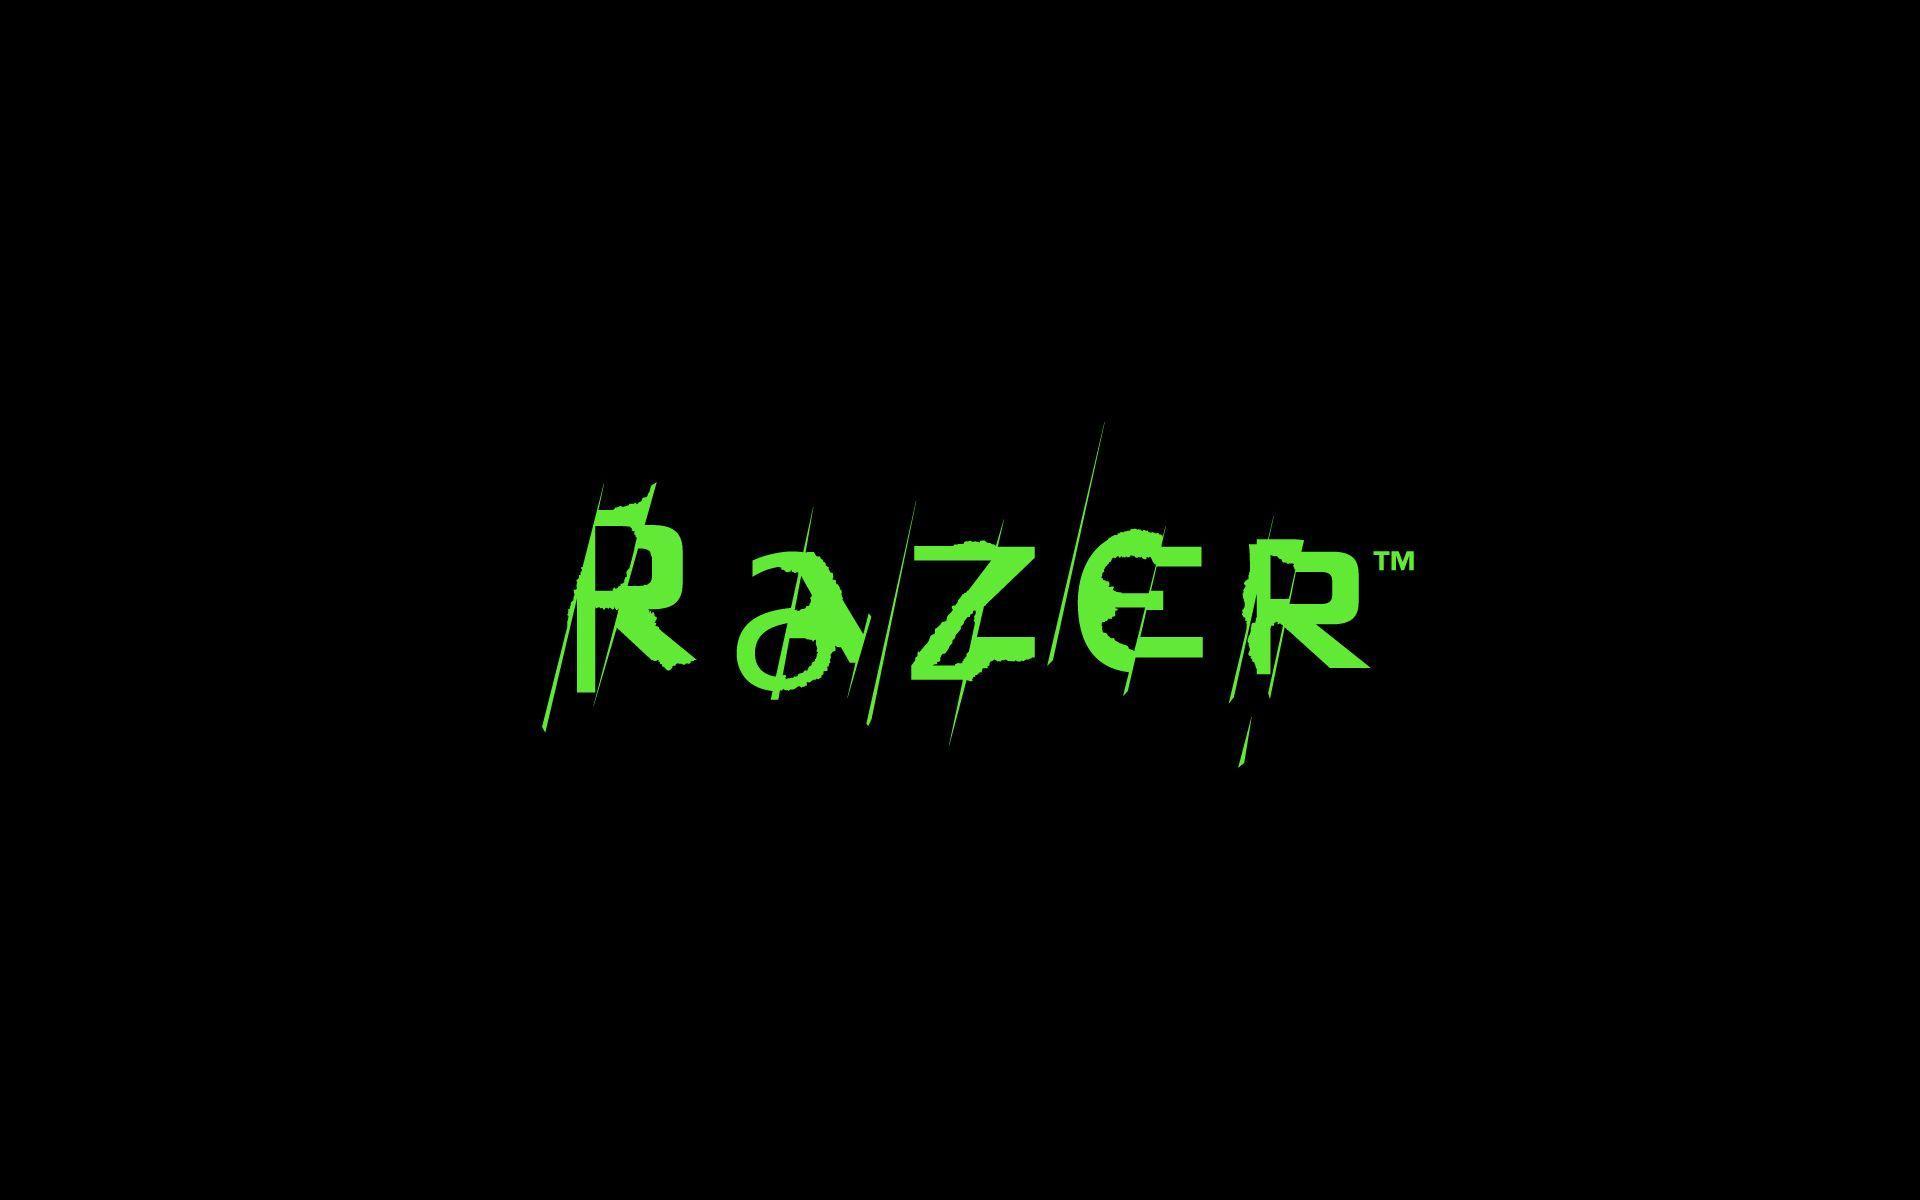 razor wallpaper computer - photo #17